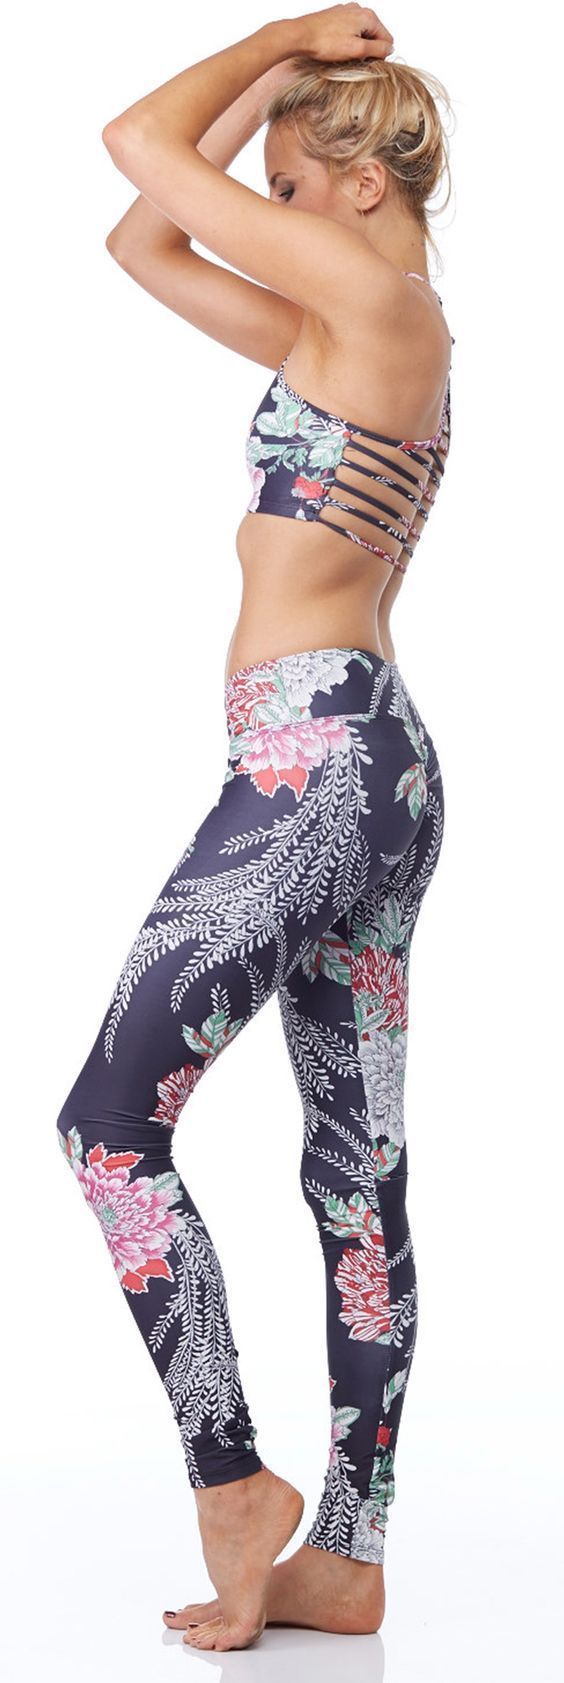 ♡ EVO Women's Workout Clothes | Yoga Tops | Sports Bra | Yoga Pants | Moti...